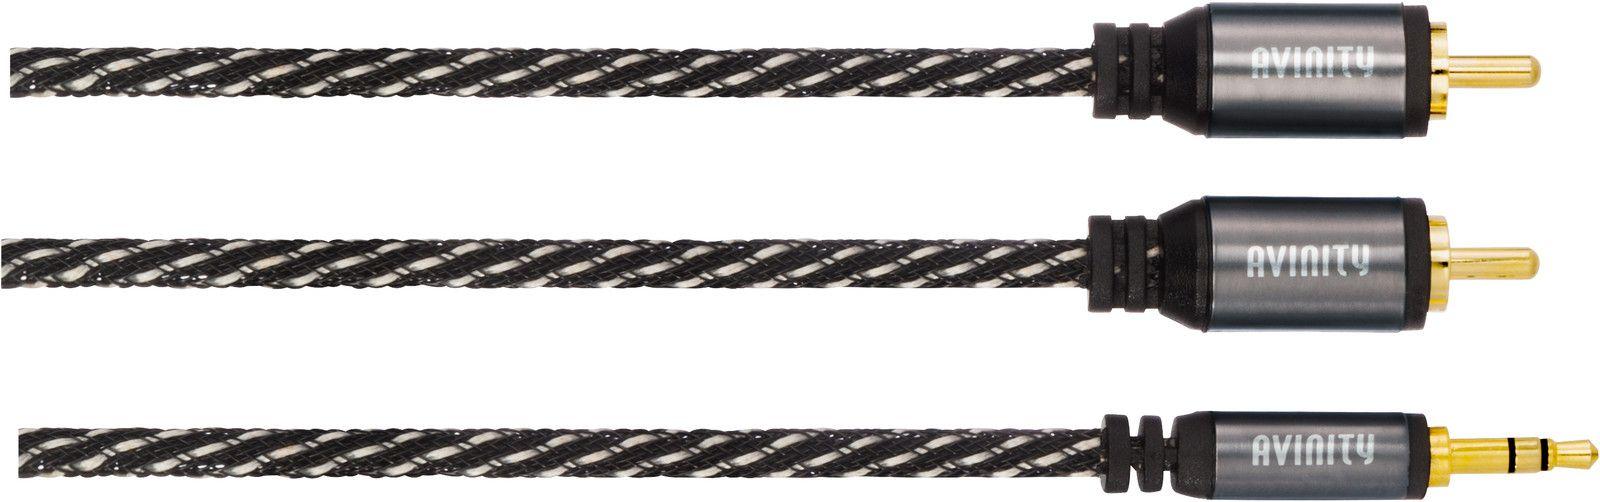 Avinity 2xRCA-3,5mm - 0,5m